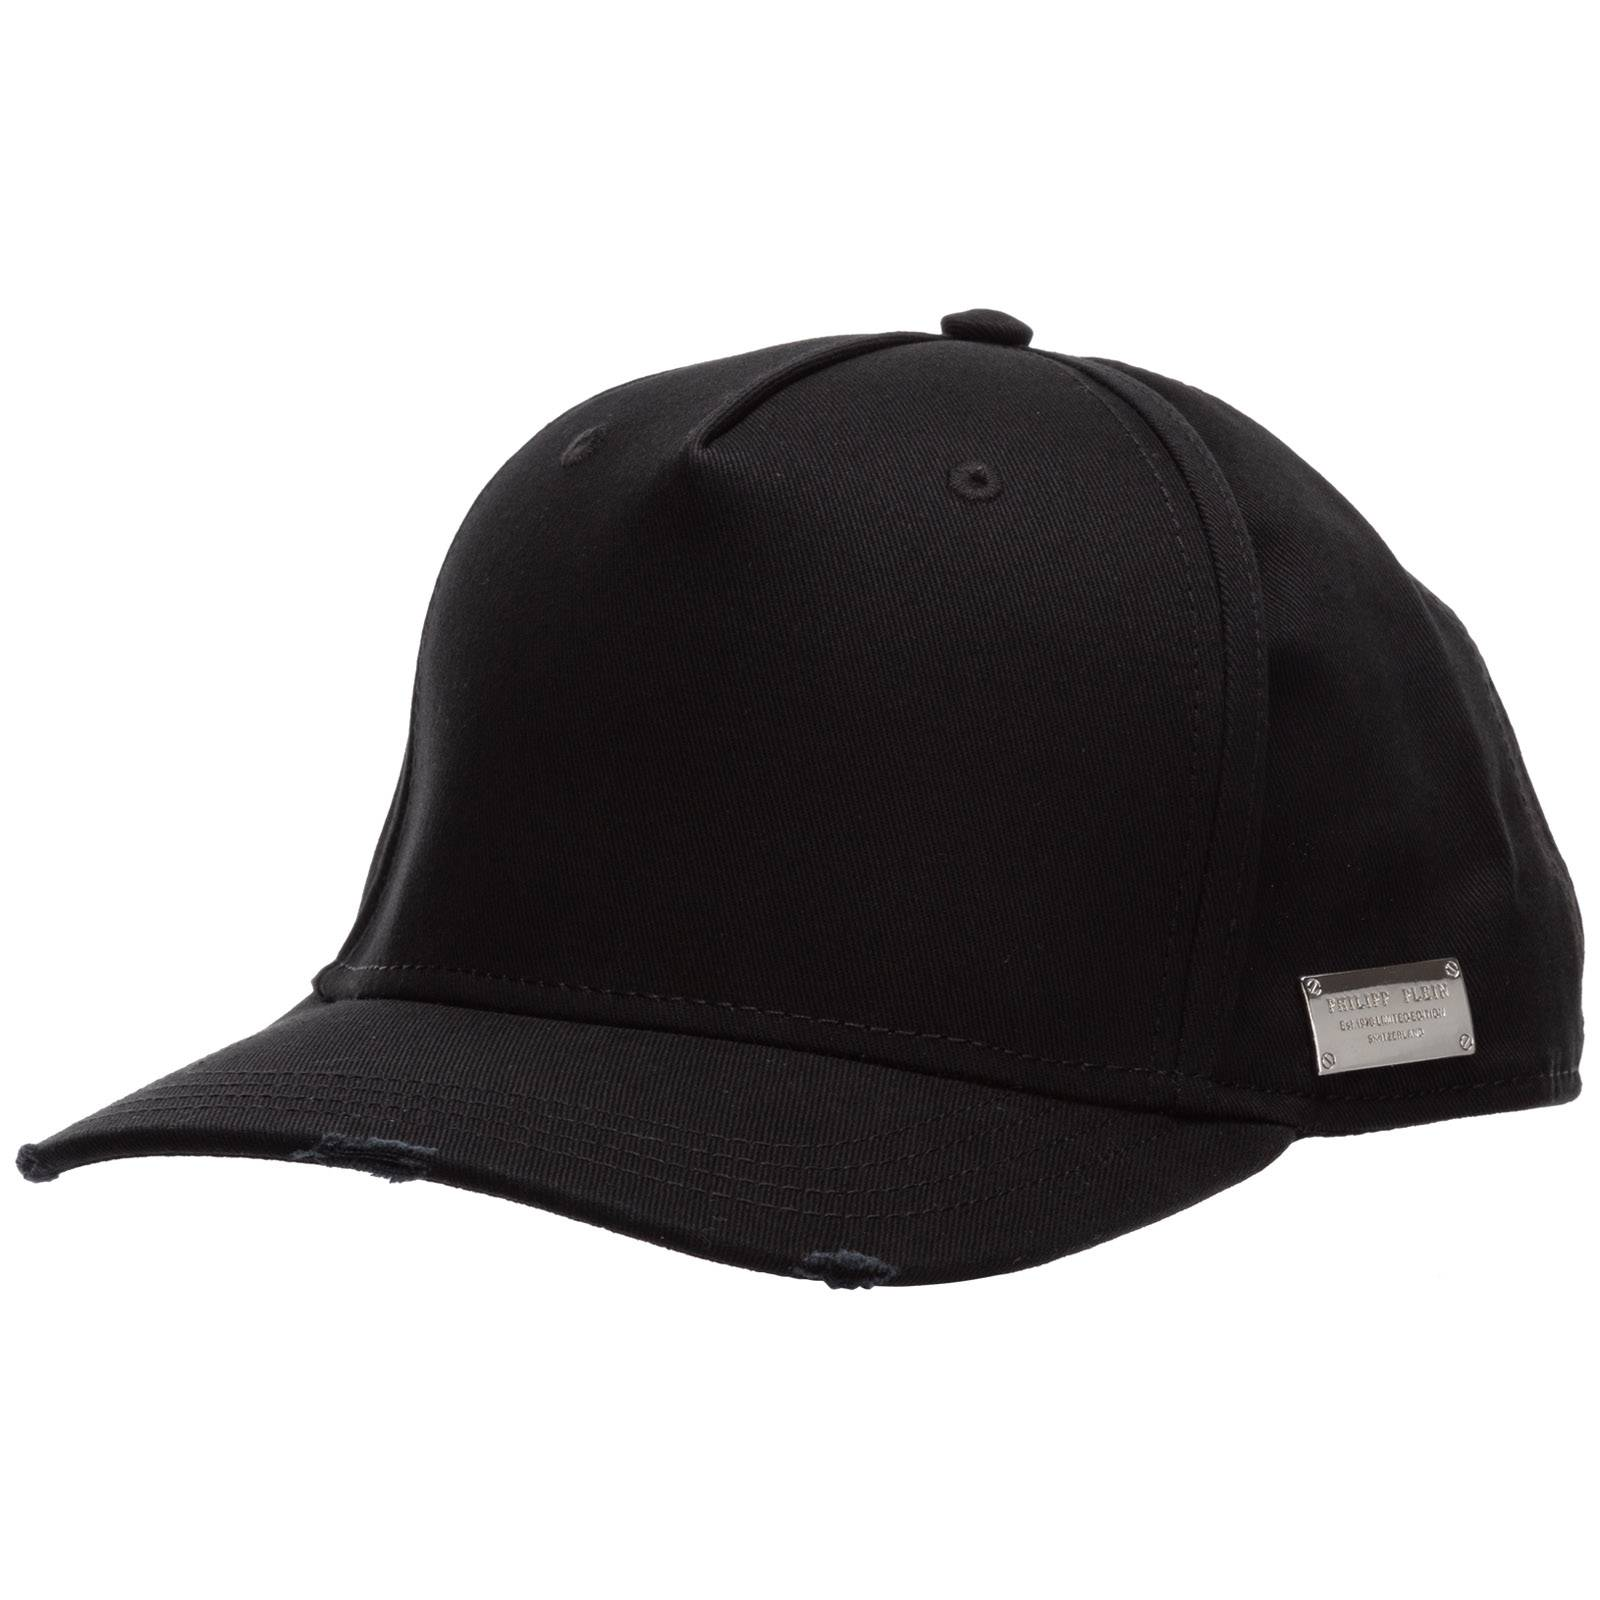 Philipp Plein Adjustable men's hat baseball cap pp hexagon  - Black